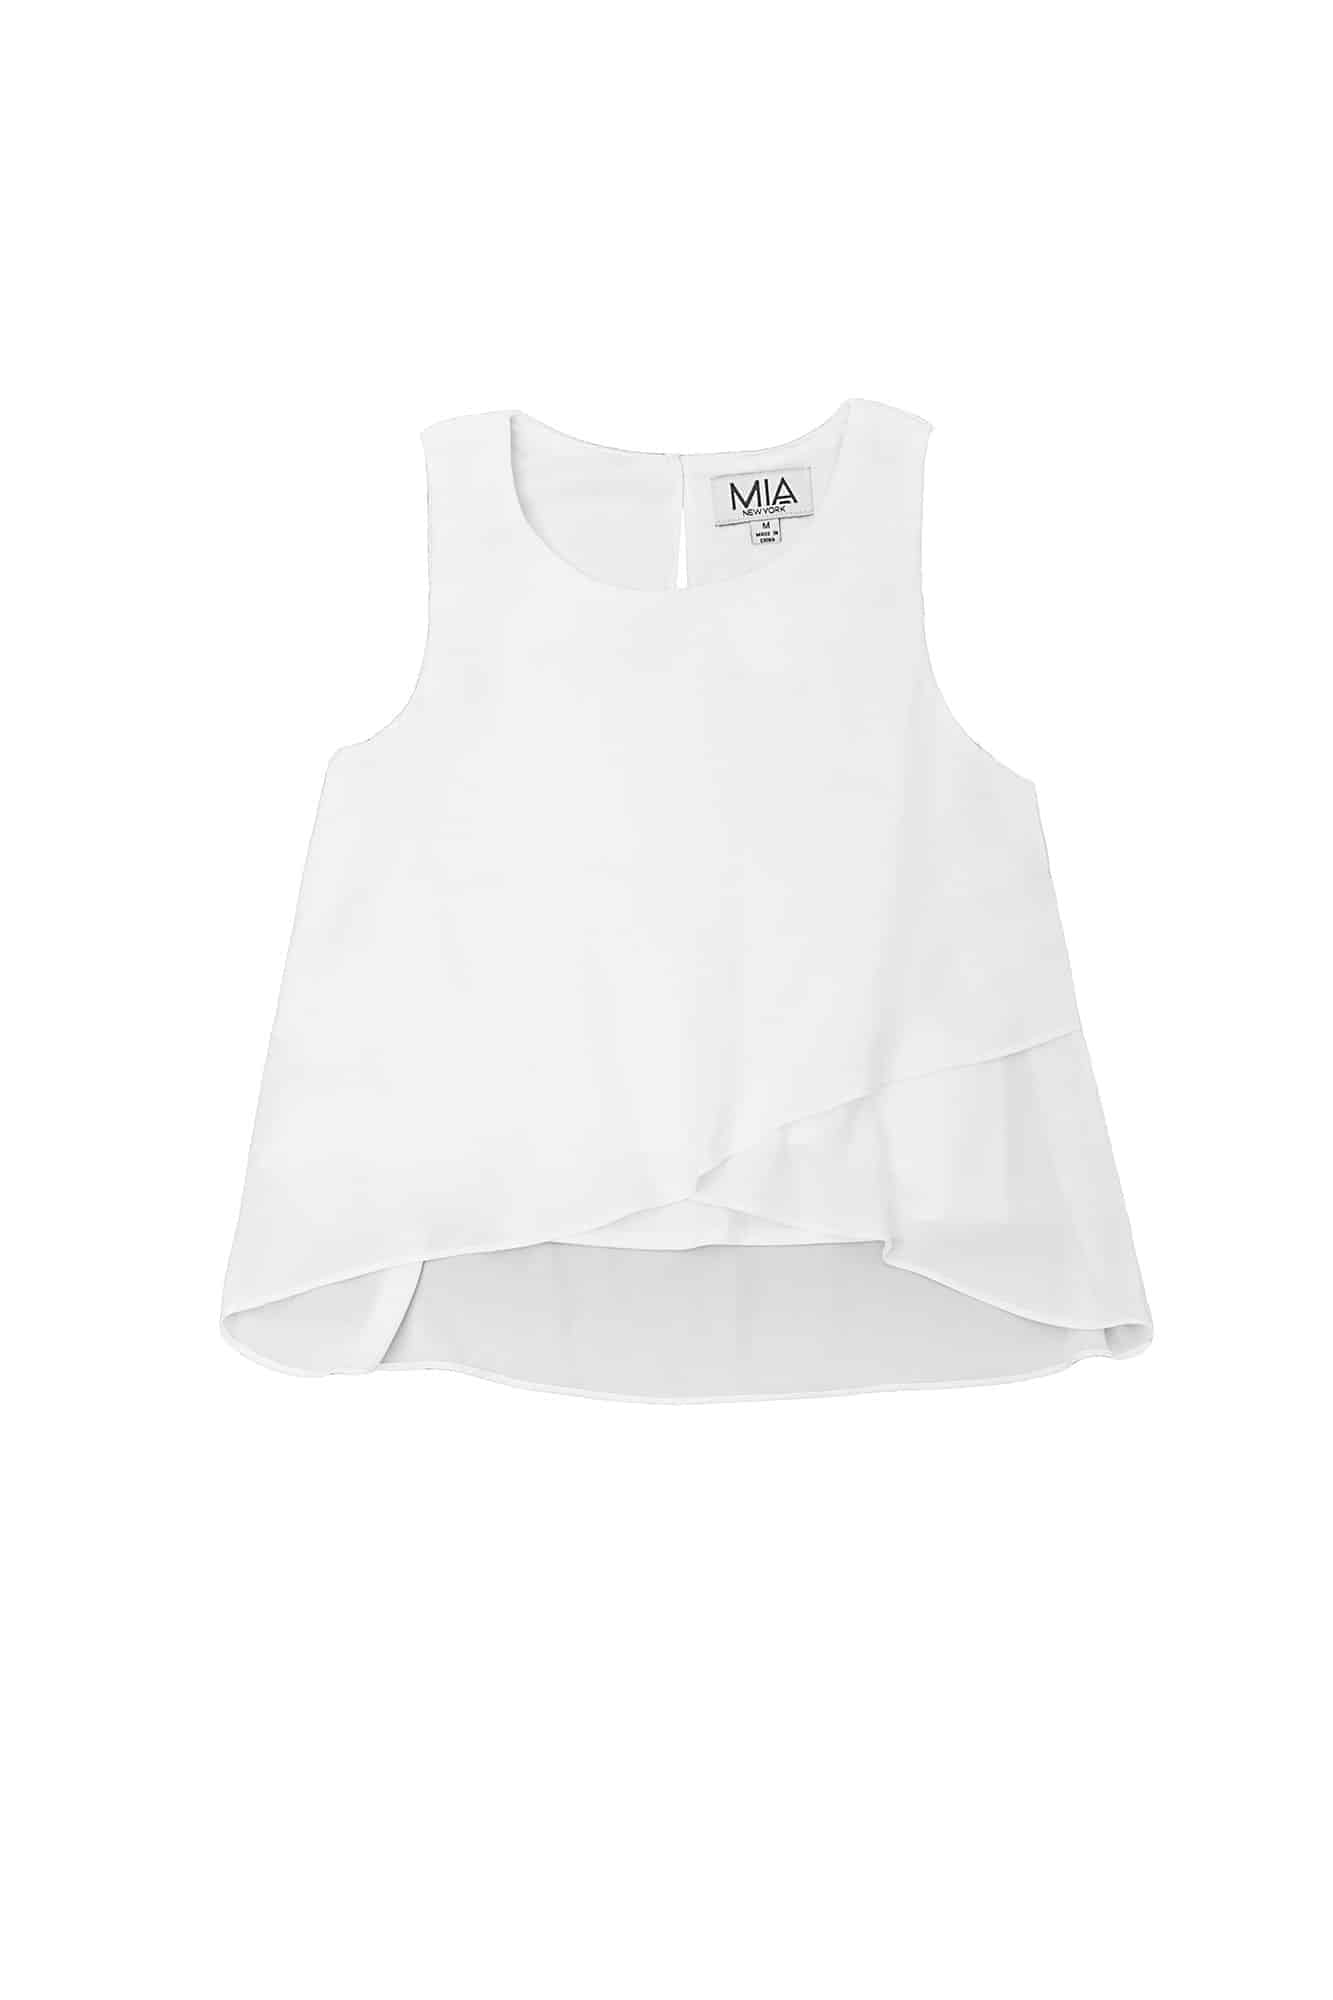 Tween Chiffon Crossover Top (White)